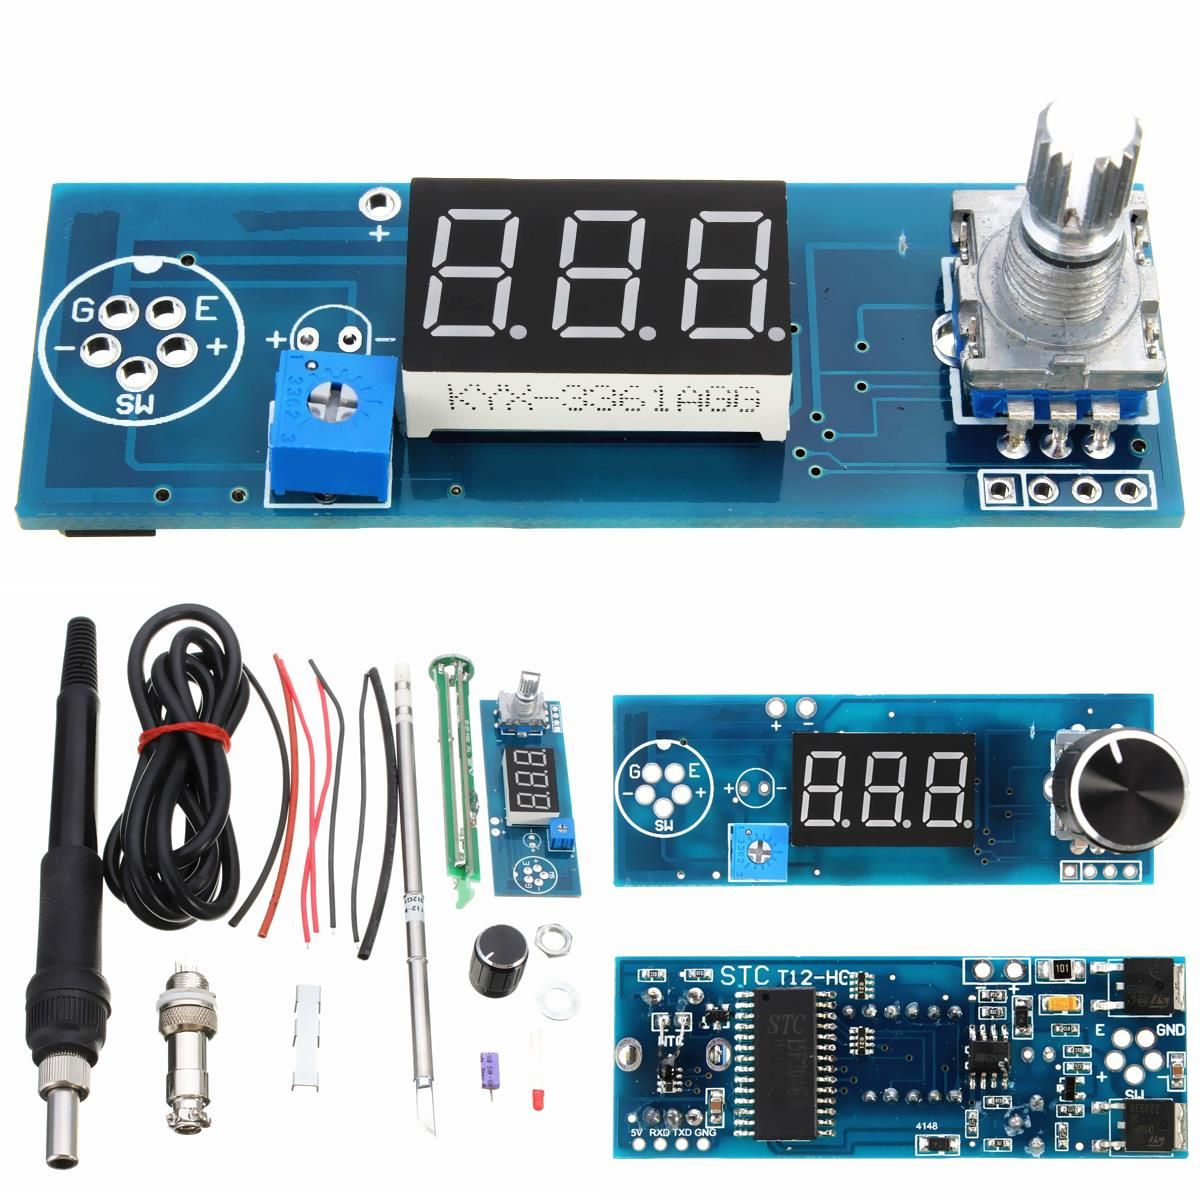 New DIY Electric Unit Basic Ability PracticalDigital Soldering Iron Station Temperature Controller Kits T12 Handle Board Modules